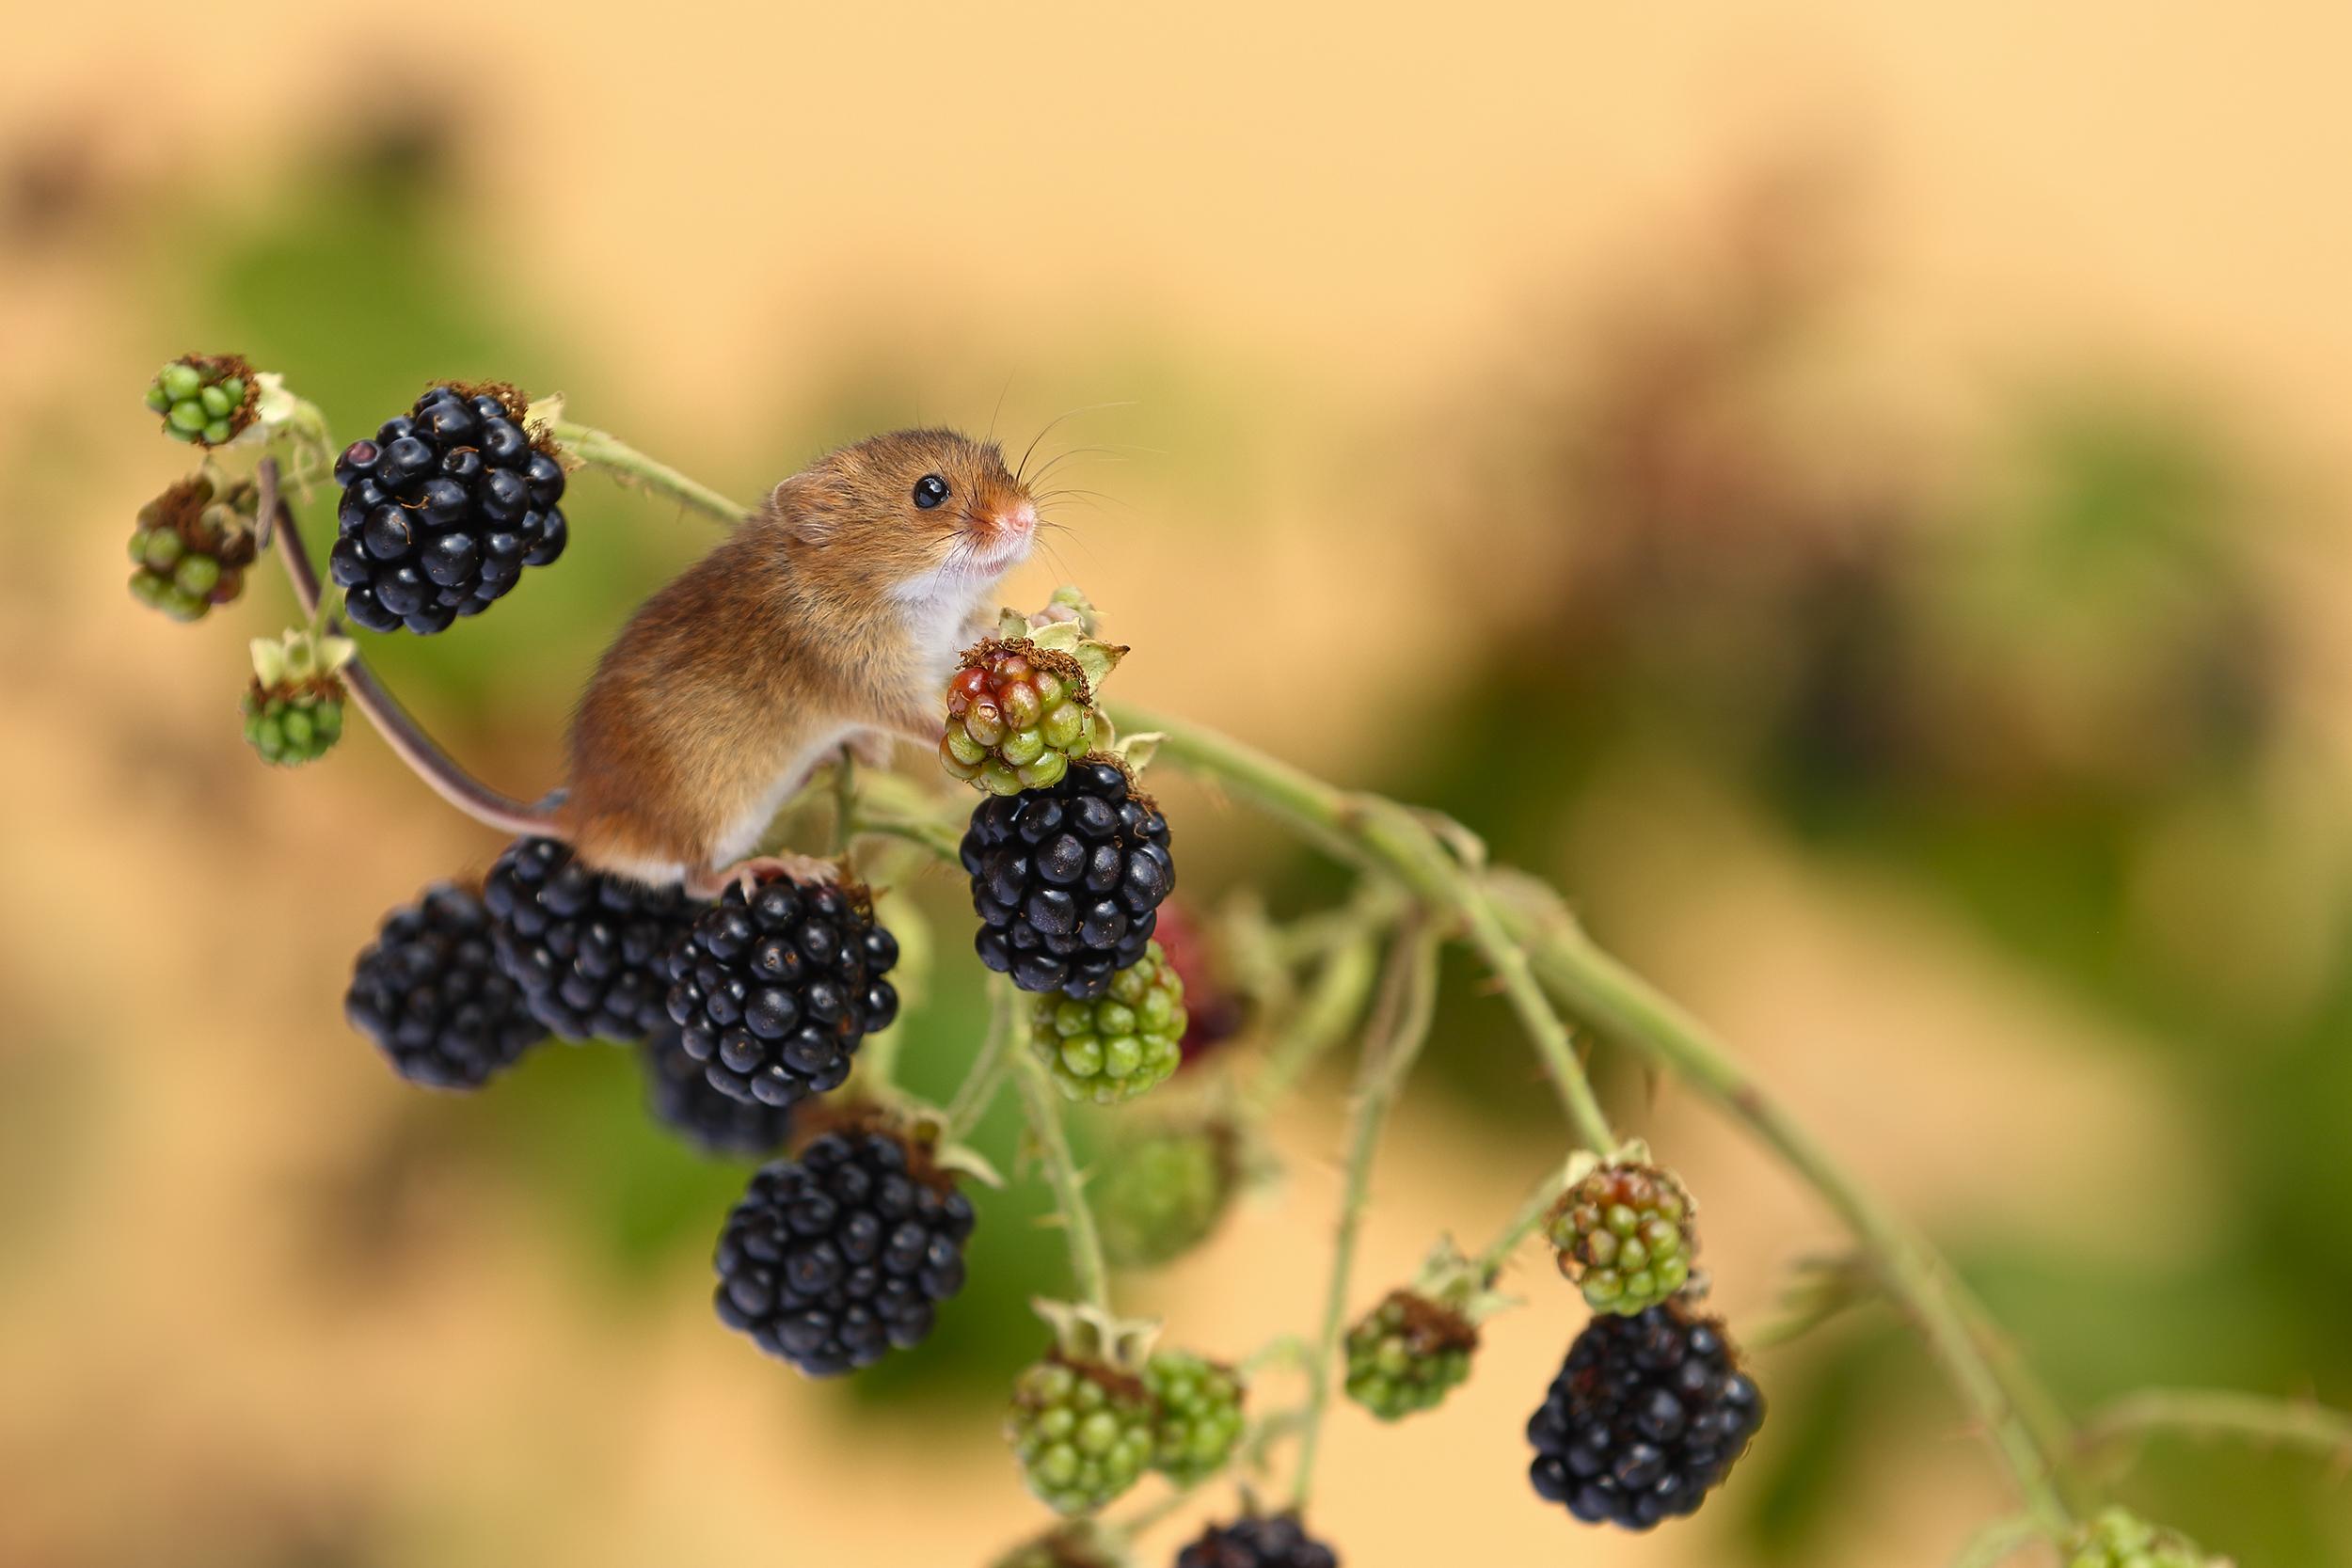 Harvest_Mice_on_Brambles.jpg